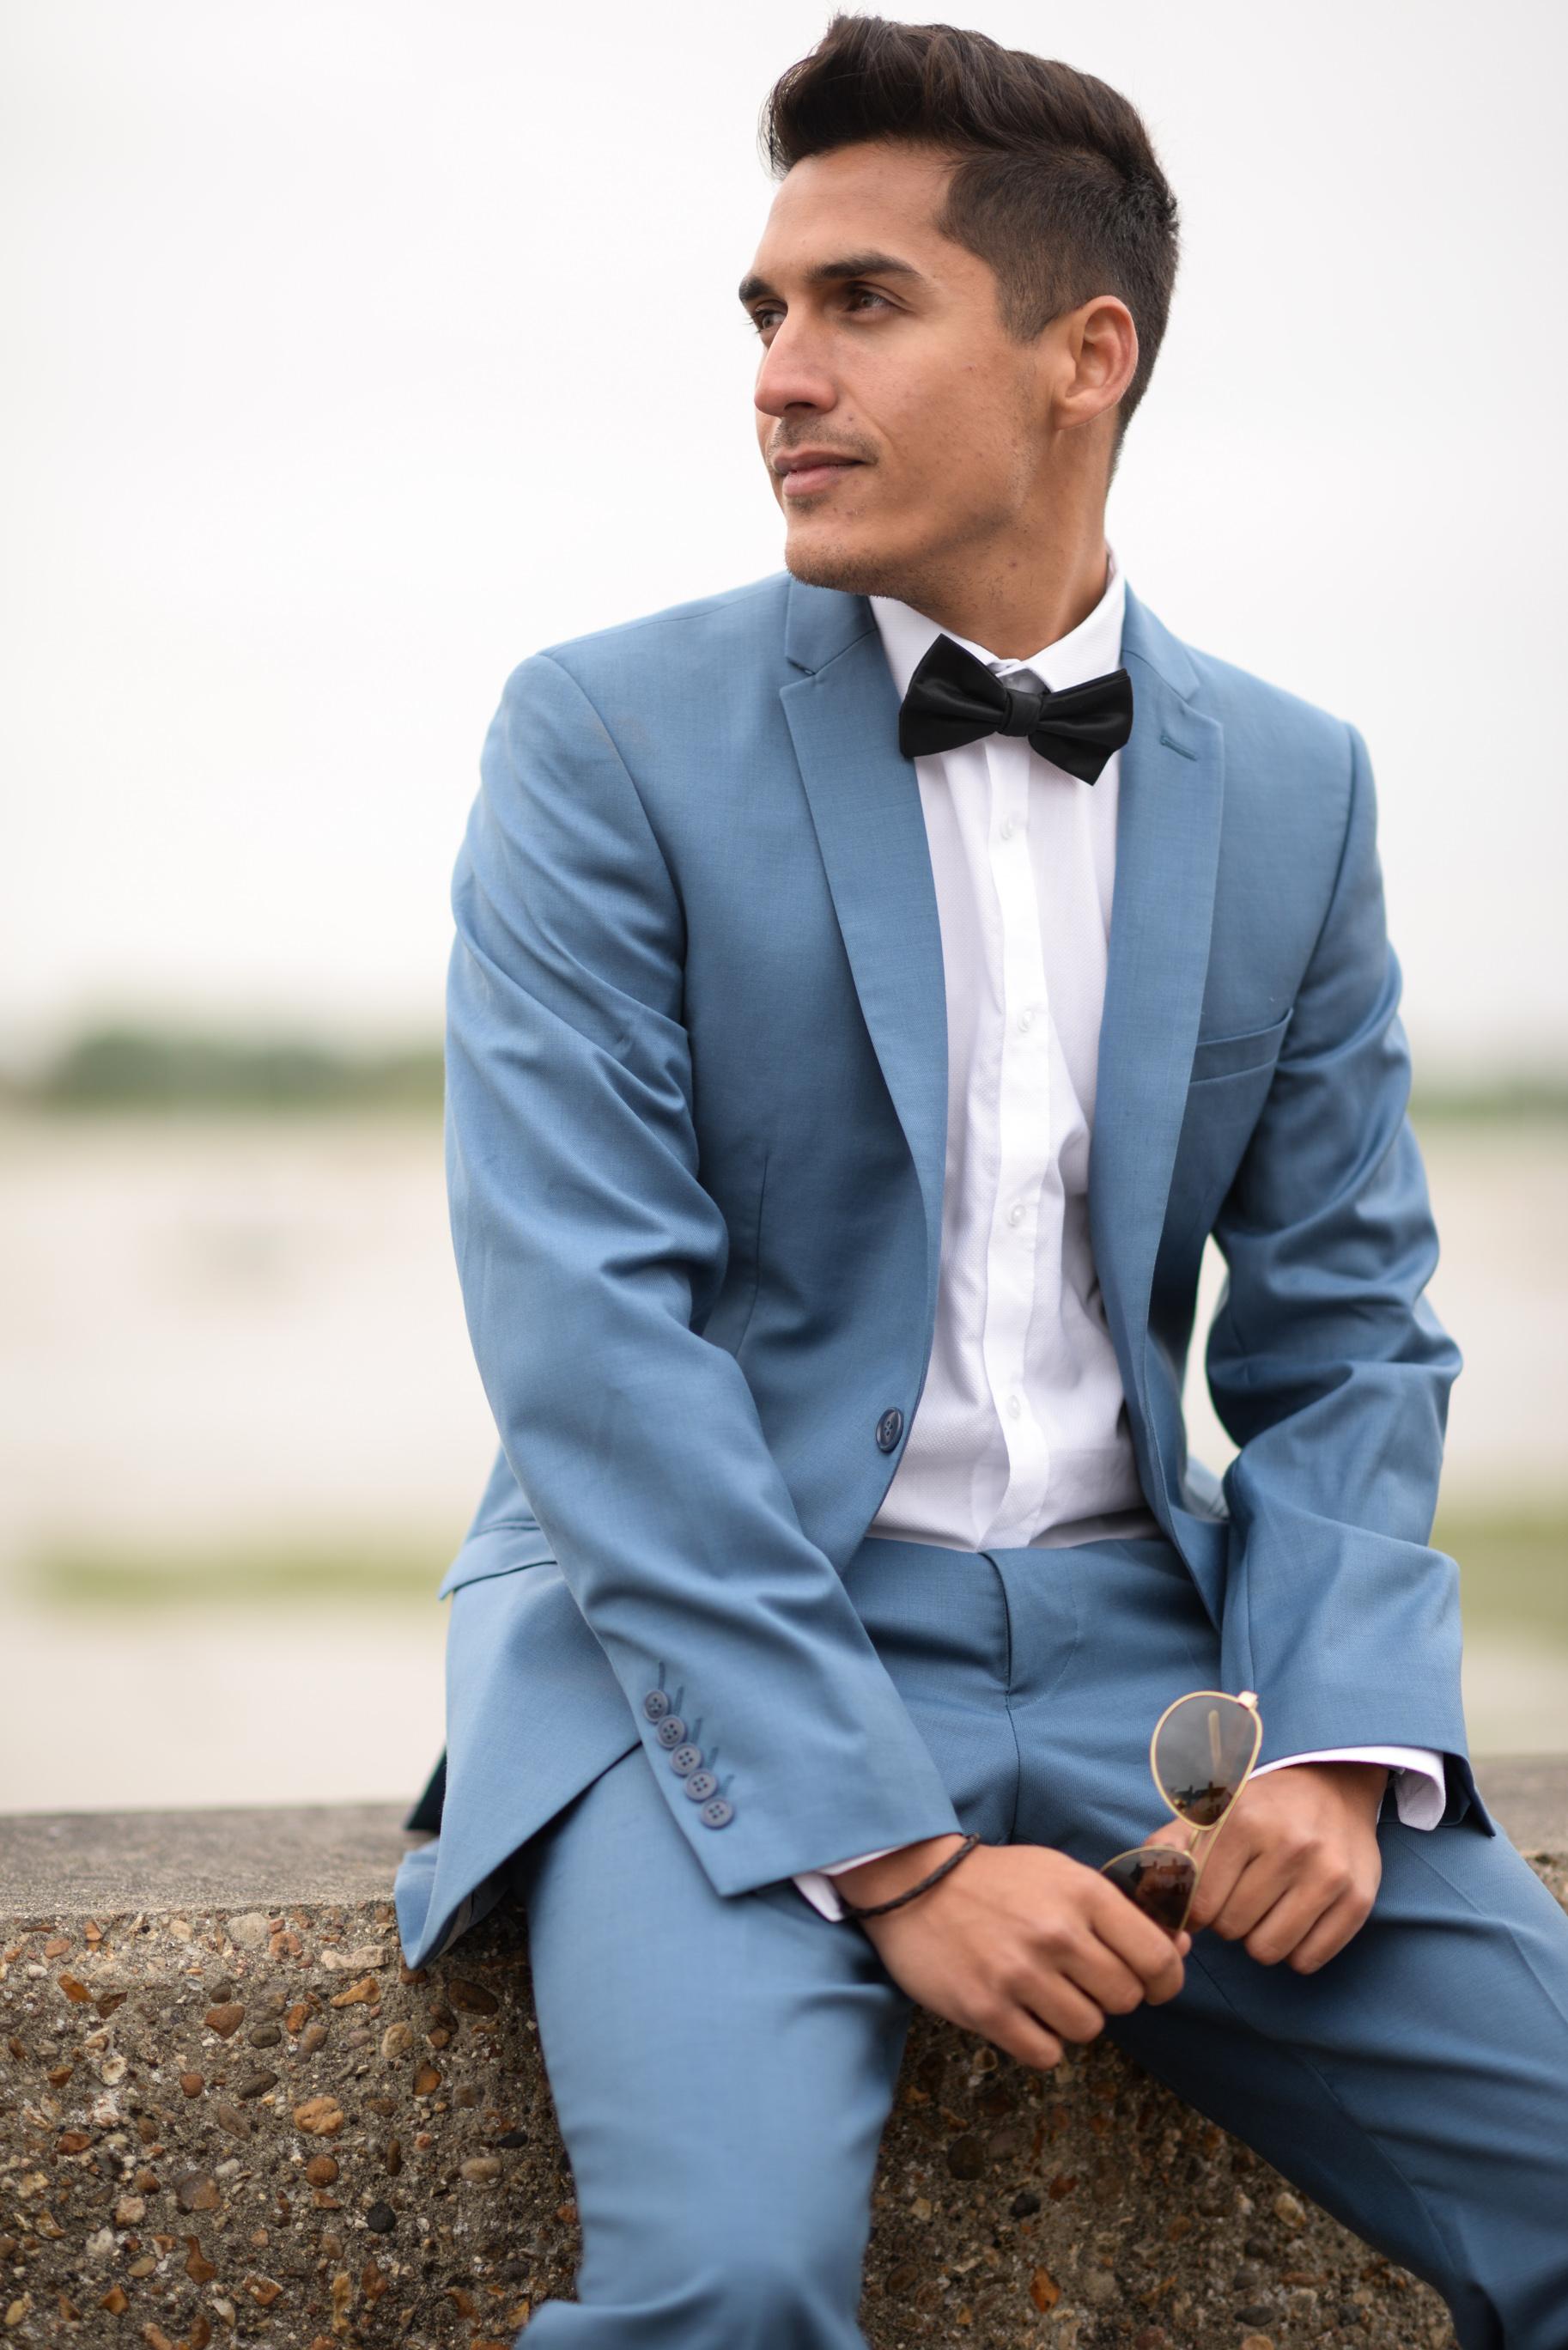 Male corporate singer Idreiss